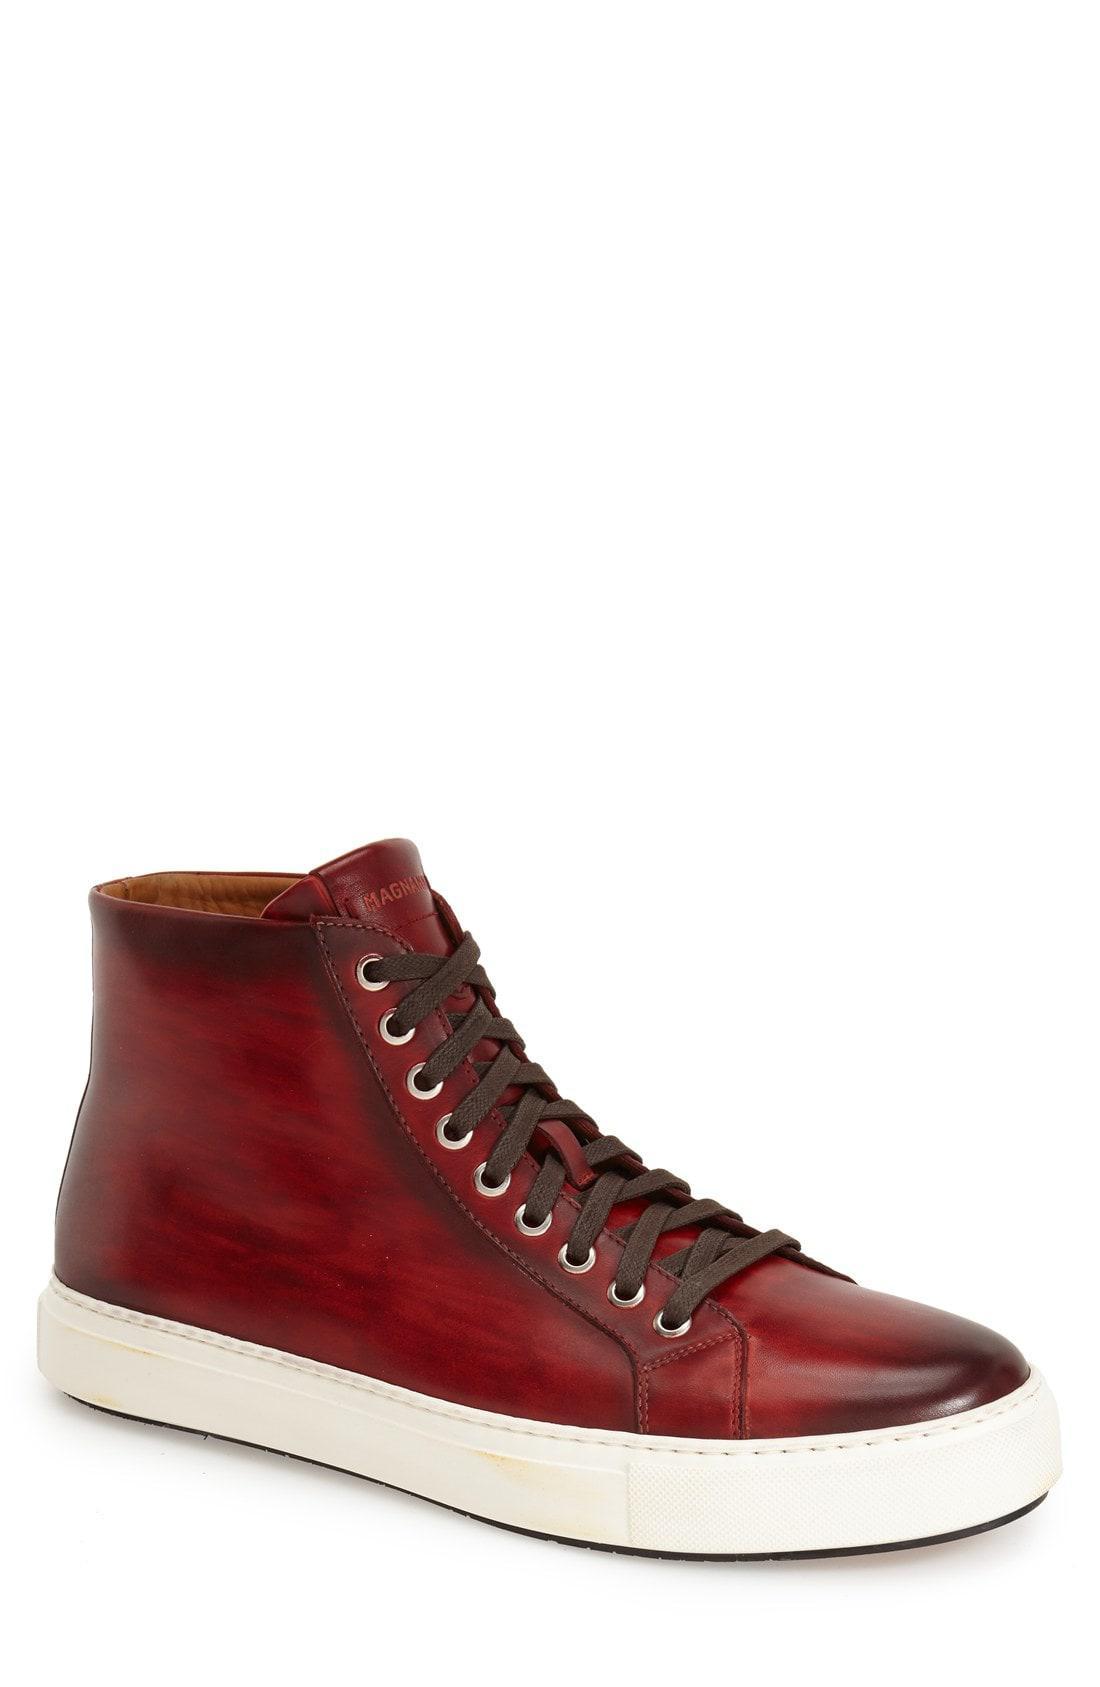 Magnanni Leather 'brando' High Top